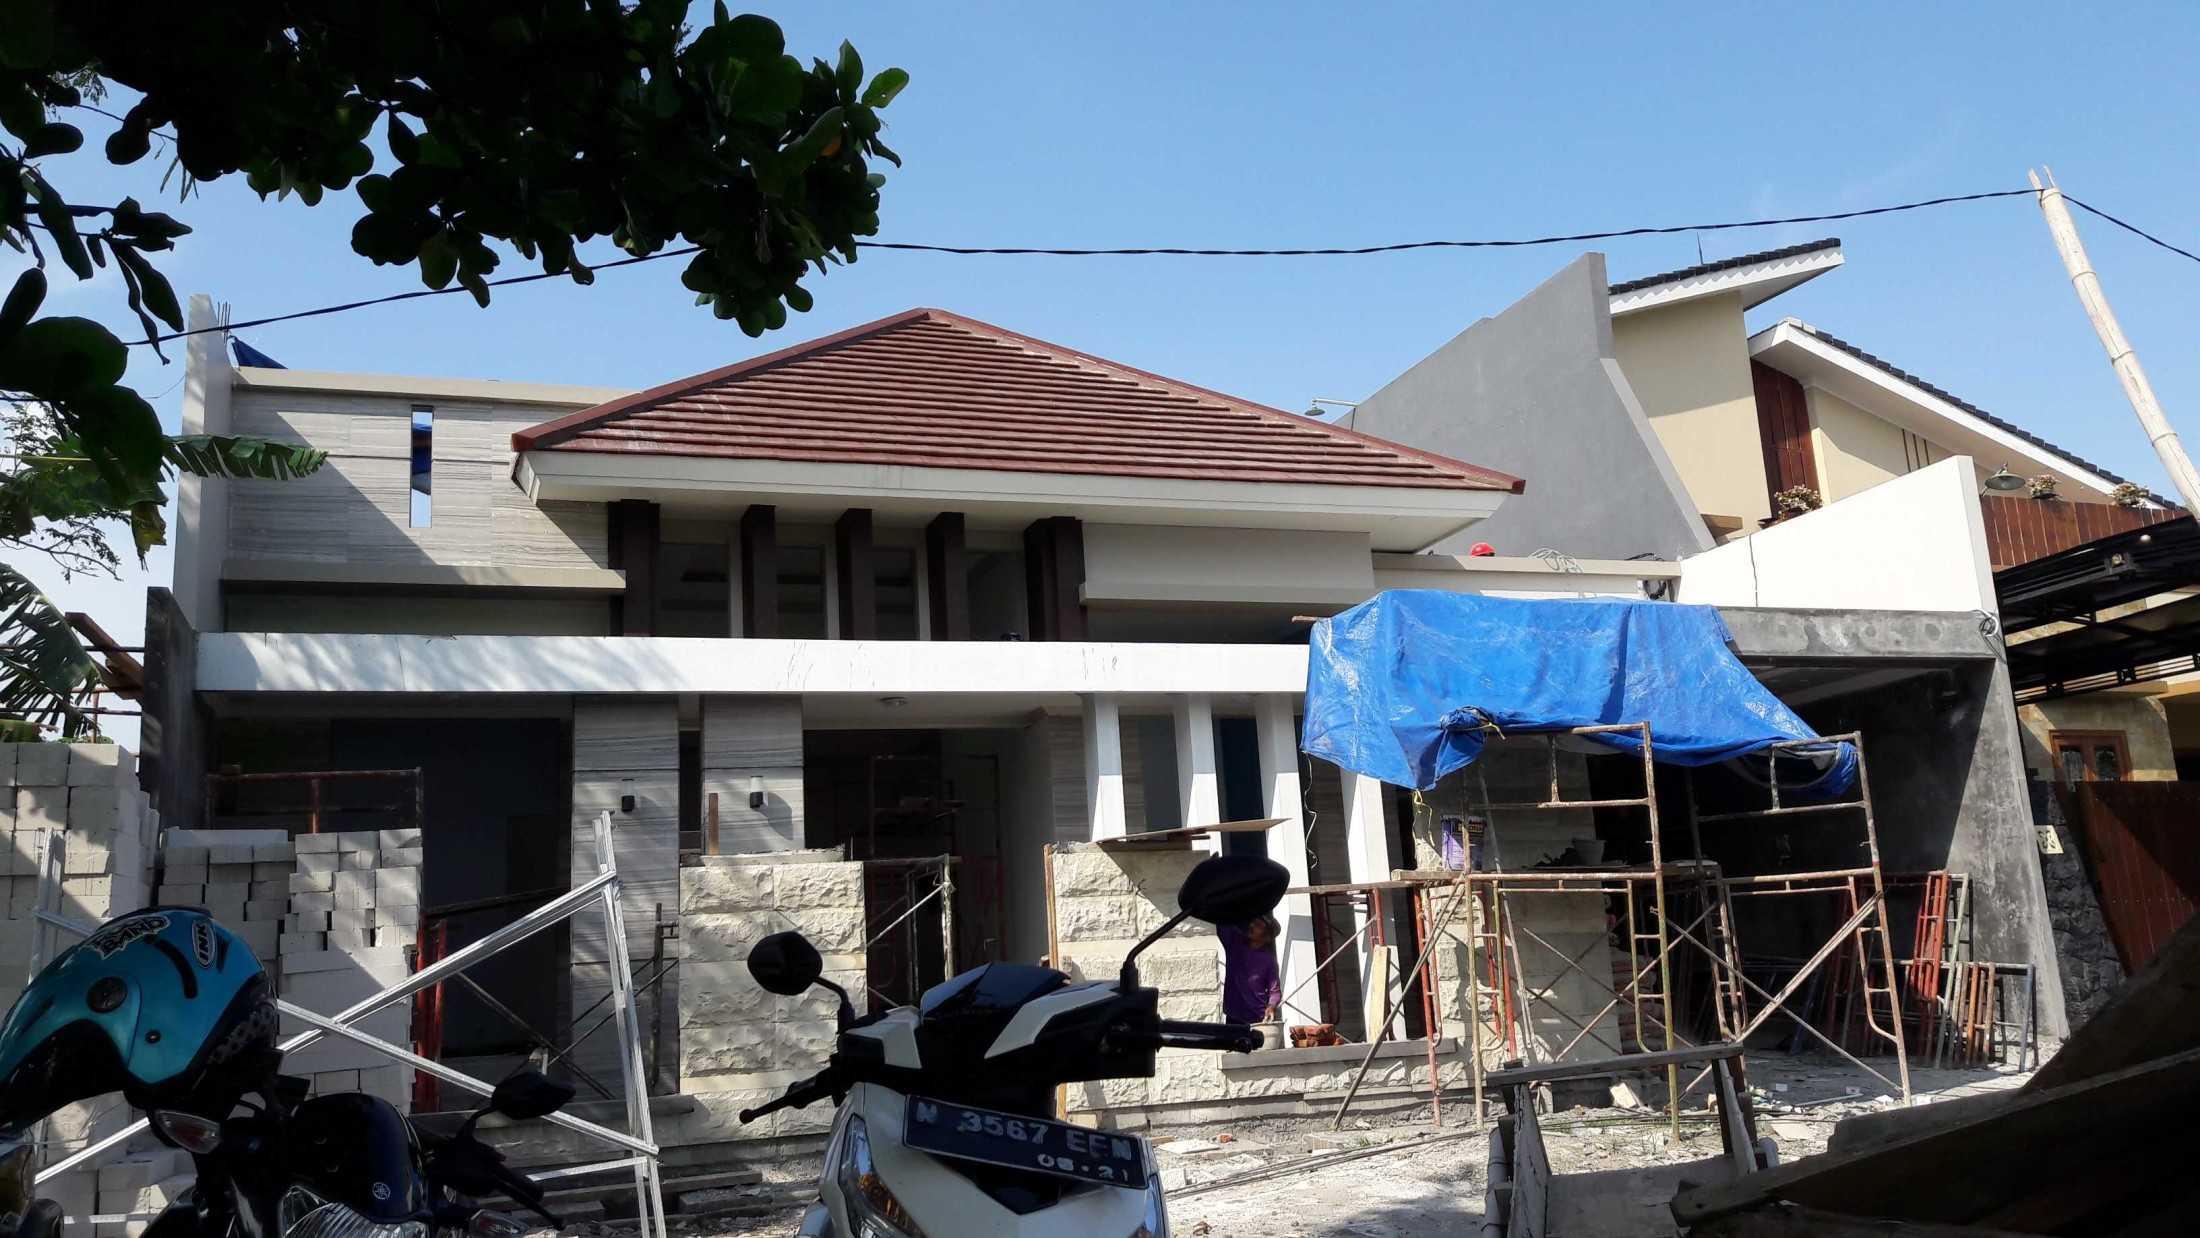 Gradasi Sam House Surabaya, Kota Sby, Jawa Timur, Indonesia Surabaya, Kota Sby, Jawa Timur, Indonesia Gradasi7-Rumah-Bpk-Sam  88990